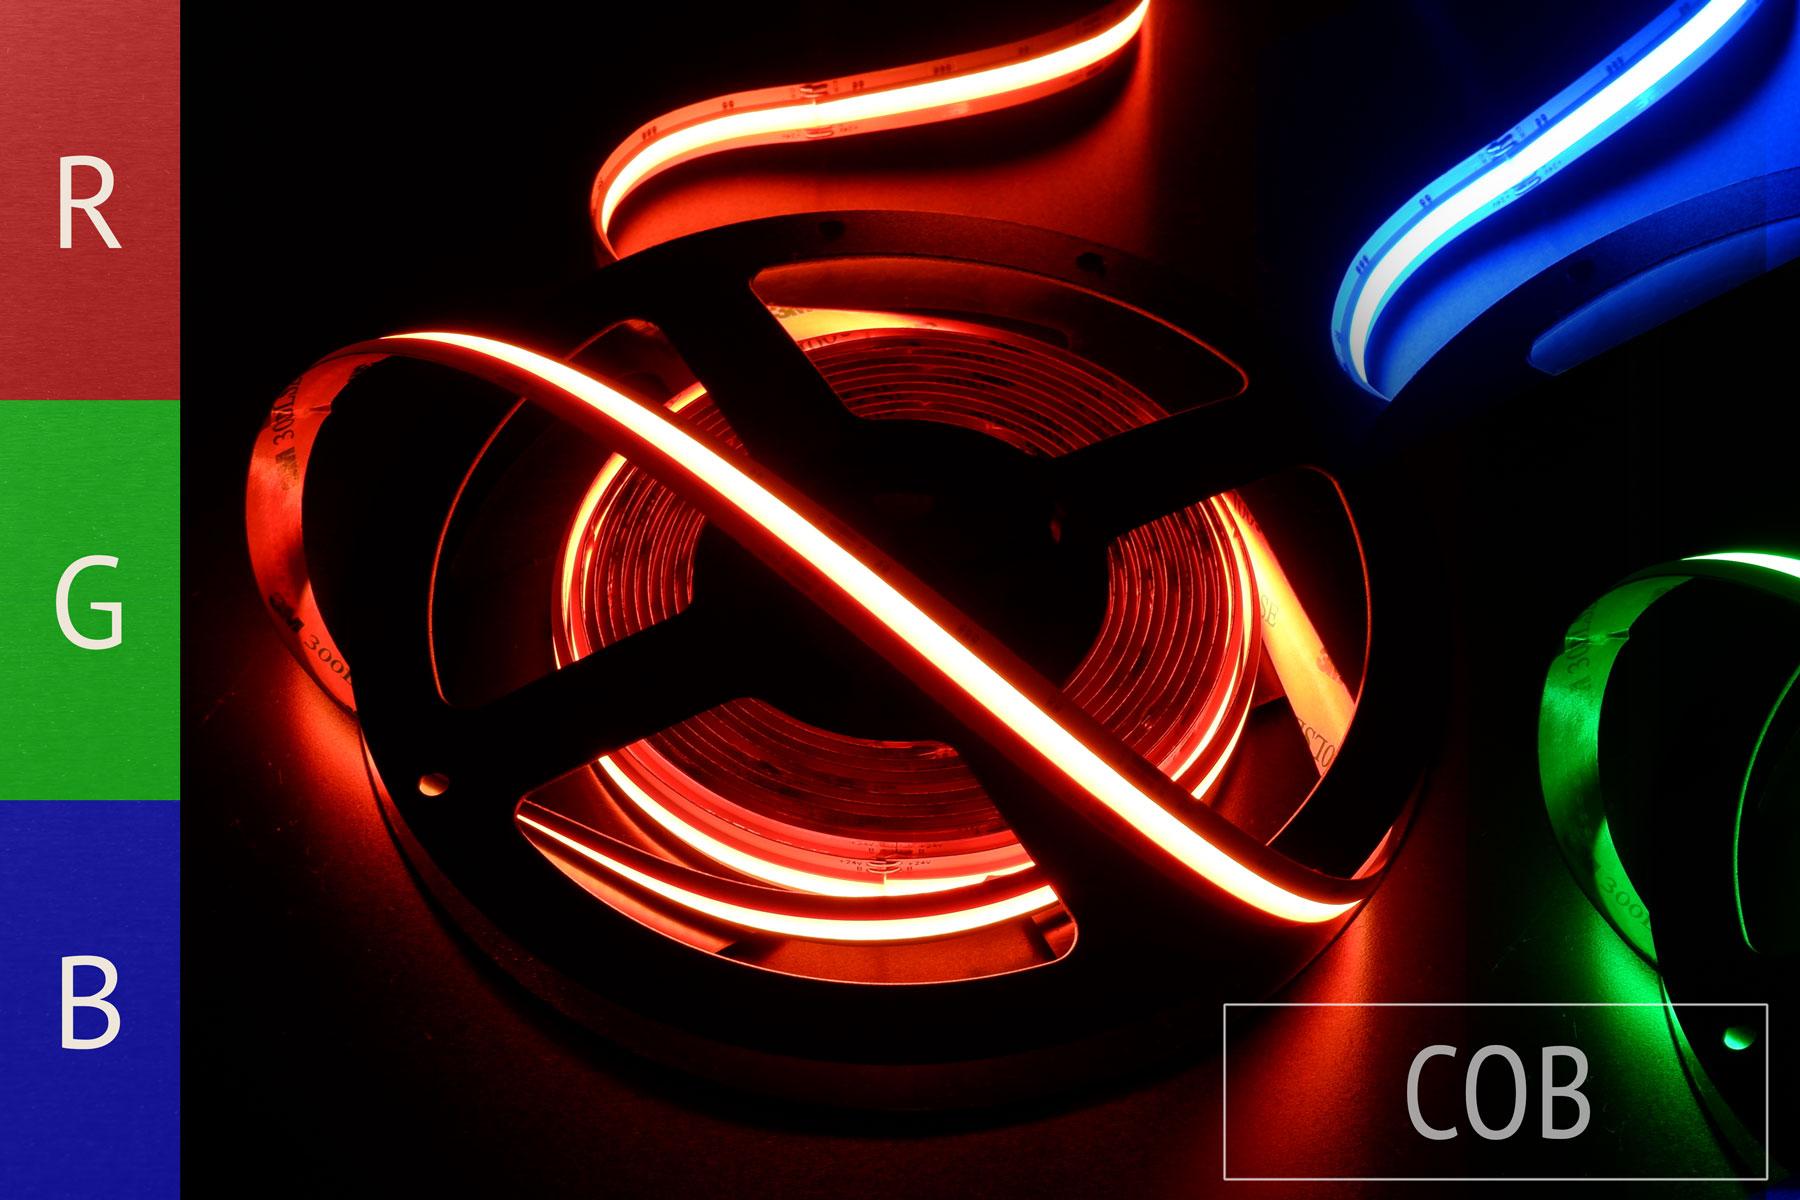 Neuheit: RGB-COB-LED-Streifen ohne sichtbare Einzel-LEDs - 24V